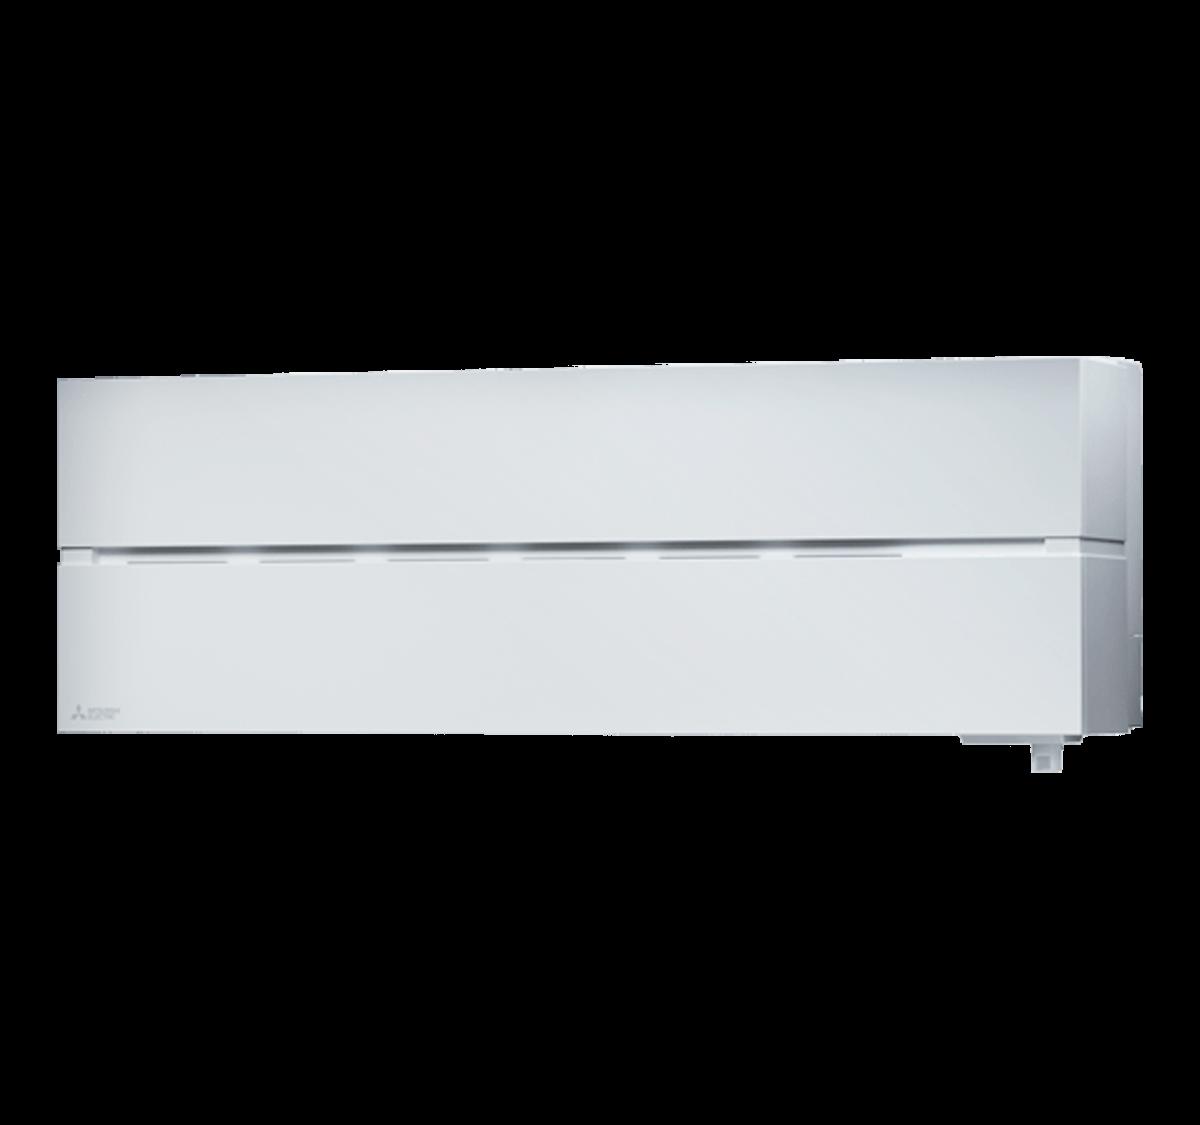 aire acondicionado unidad interior mitsubishi electric inverter msz ln25vgw serie kirigamine style modelo msz ln25vgw precio incluido instalacion caseragua 01